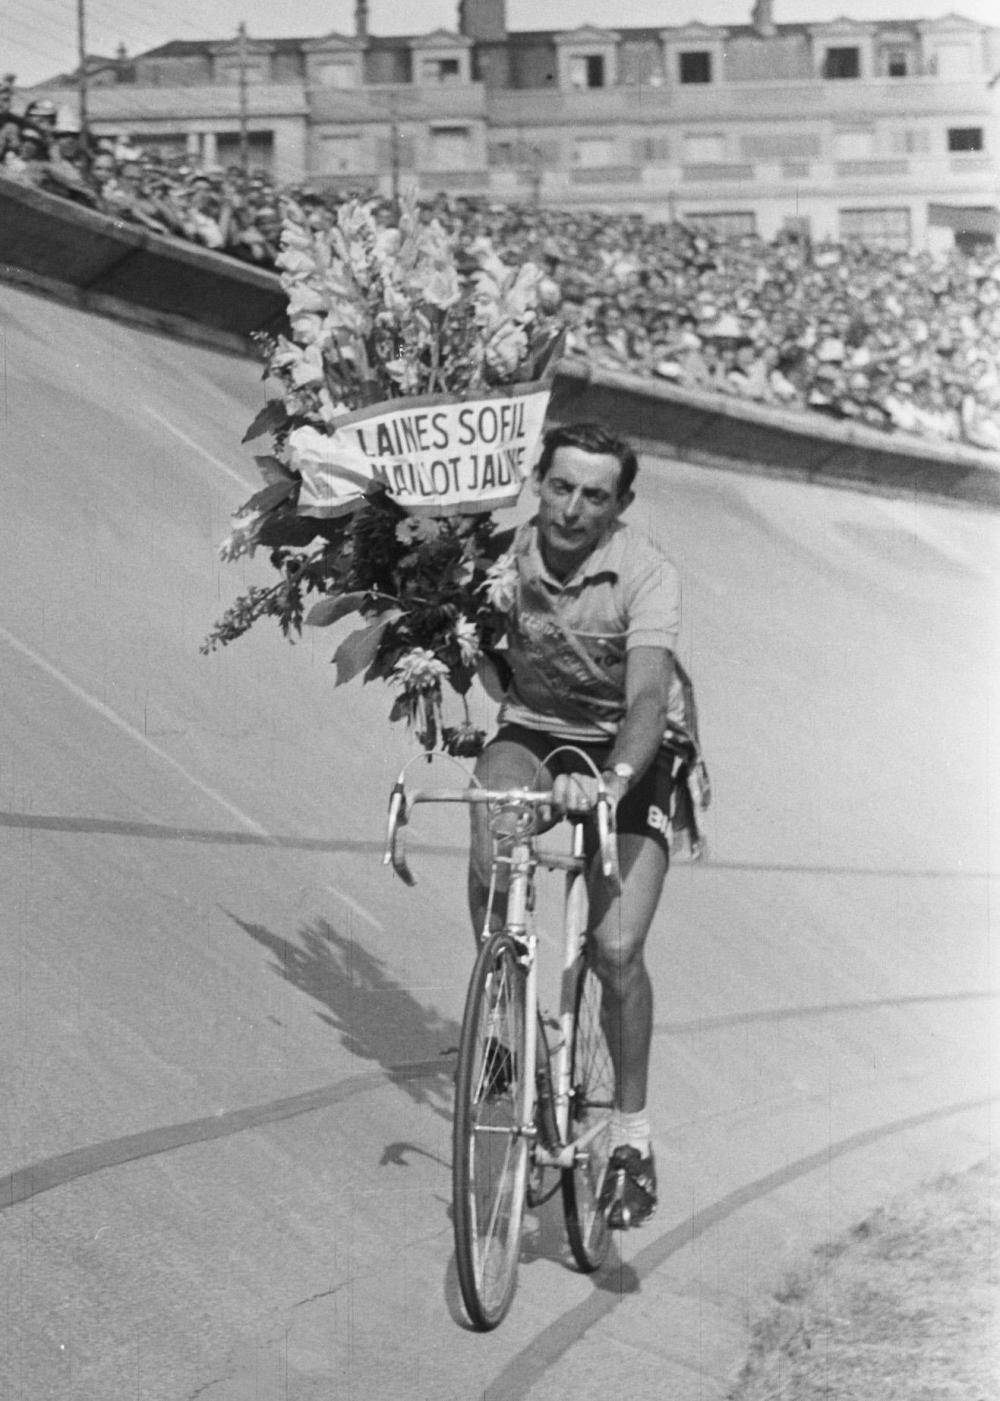 1133247174_Fausto_Coppi_Tour_de_France_1952_02.thumb.jpg.a5b6fc4928ffb5f3e7f6277284fe1665.jpg